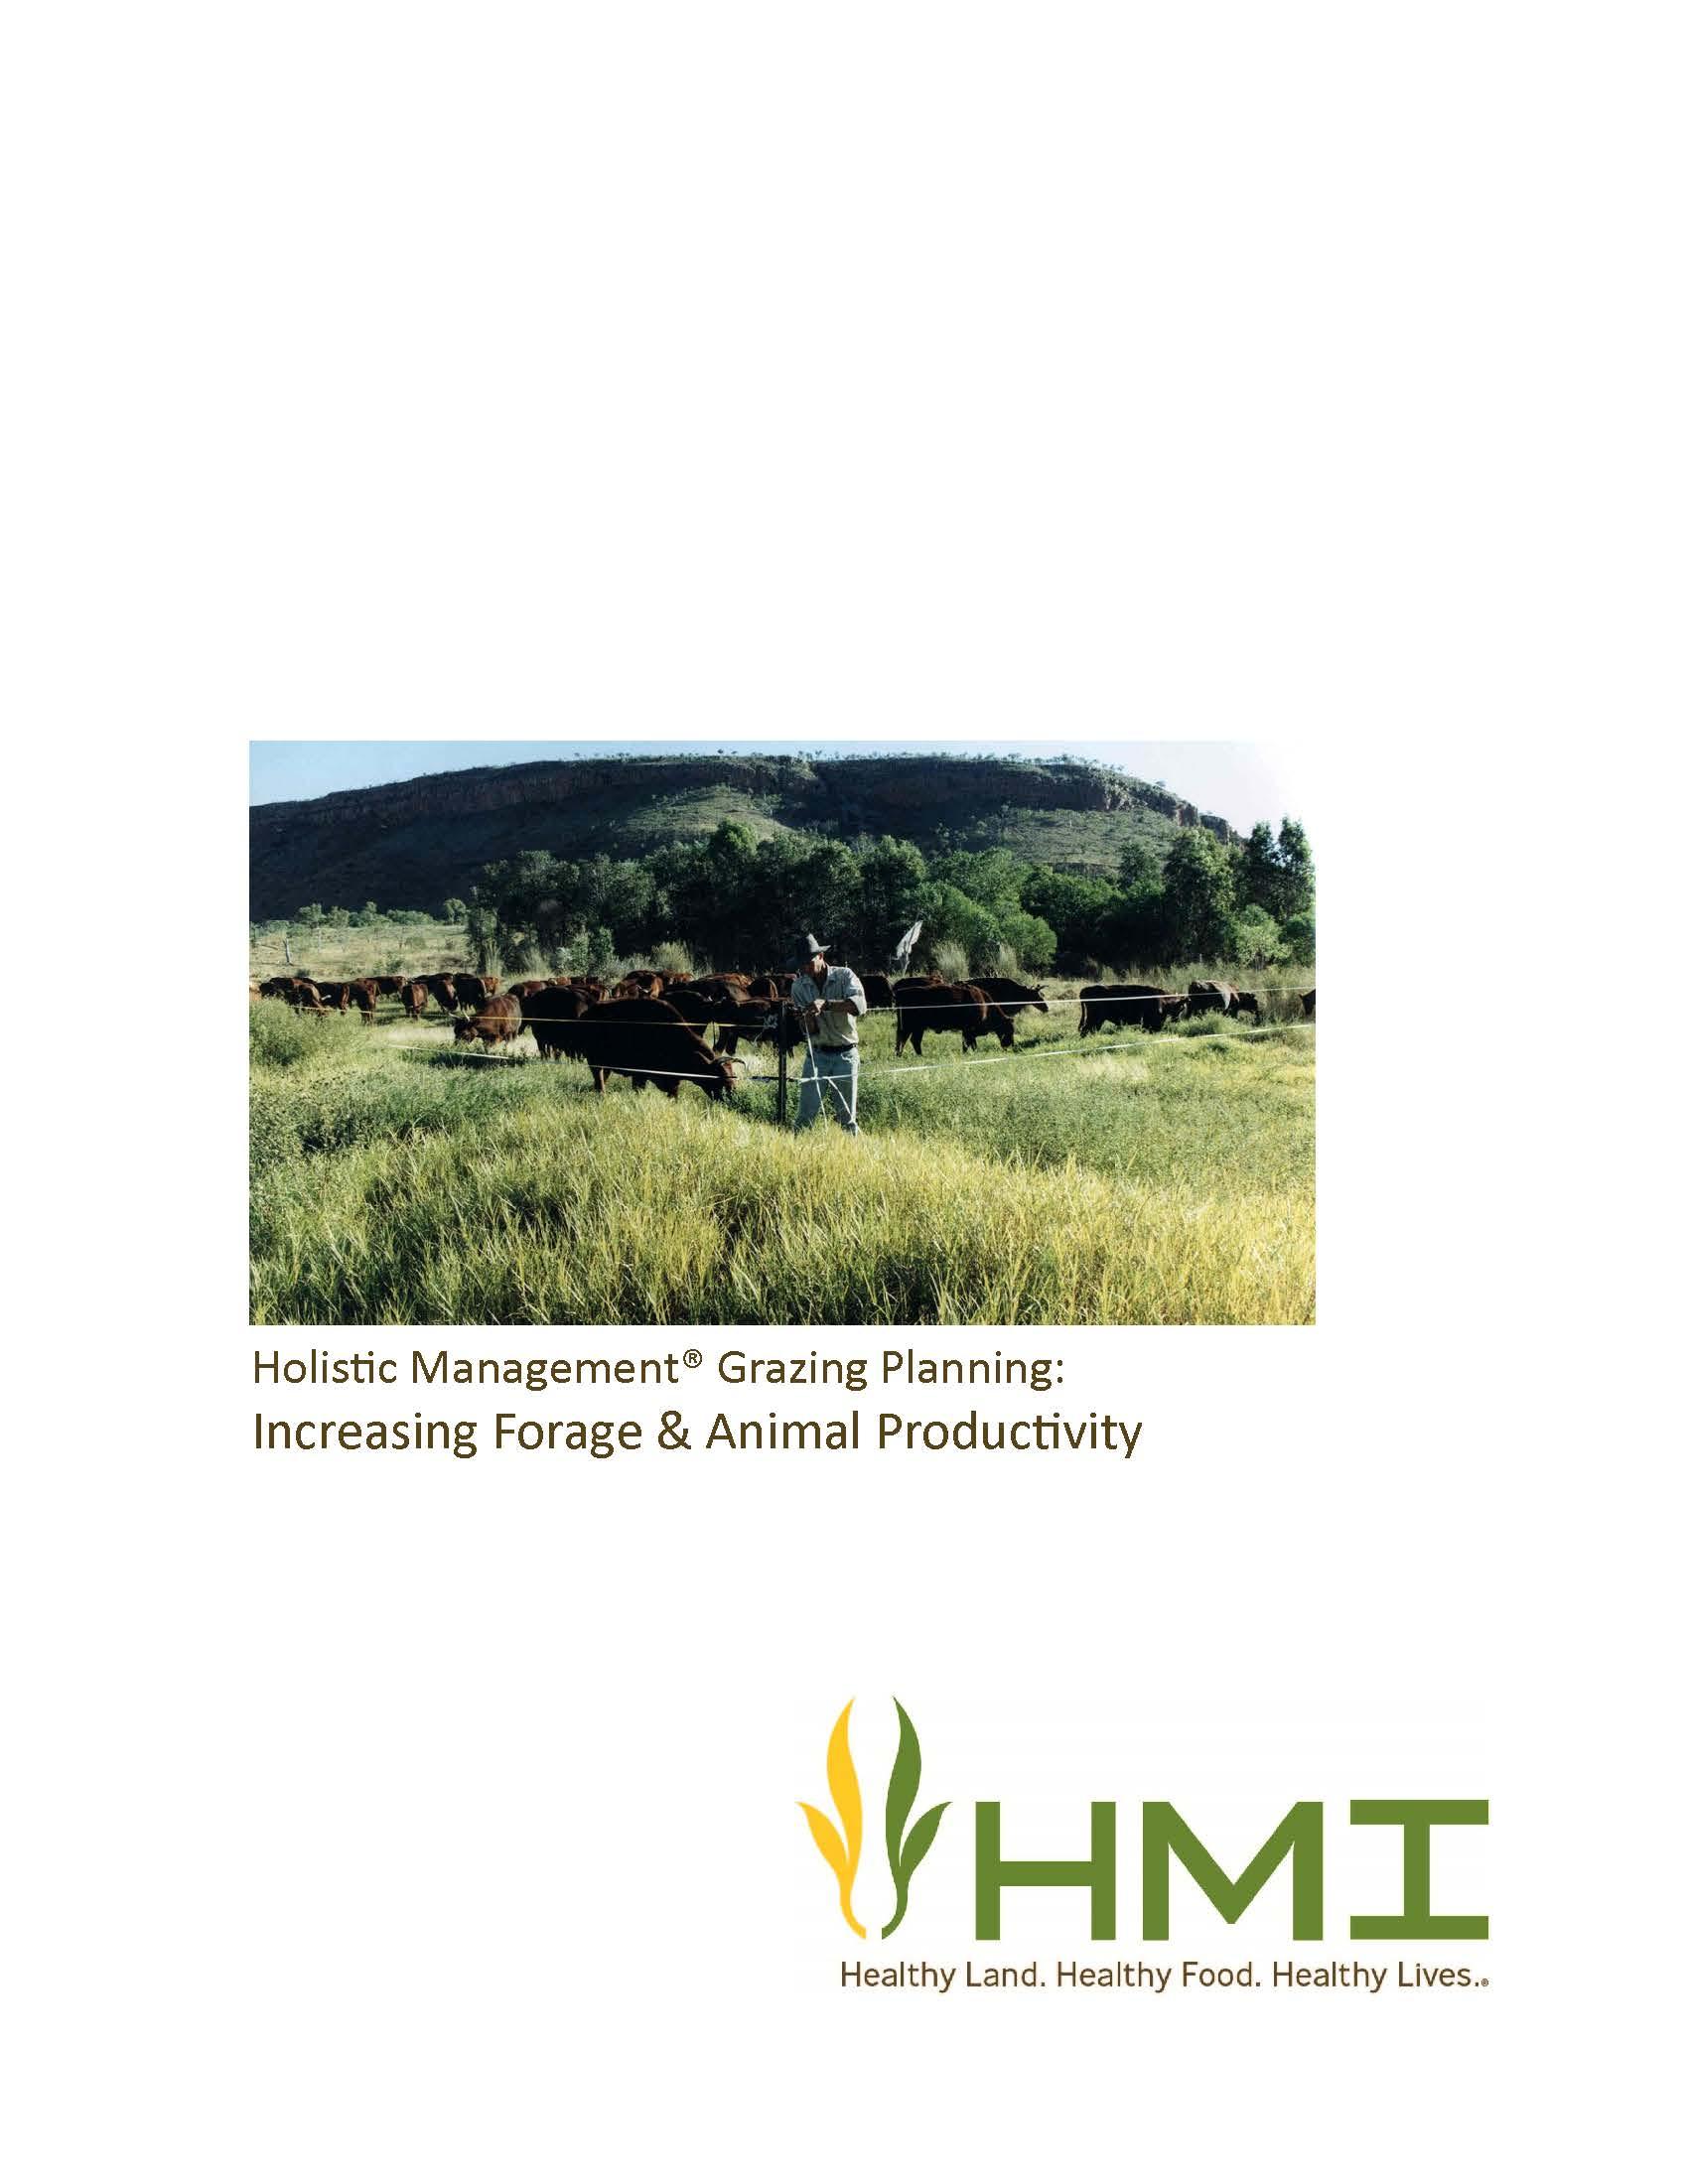 Holistic Management Grazing Planning Manual